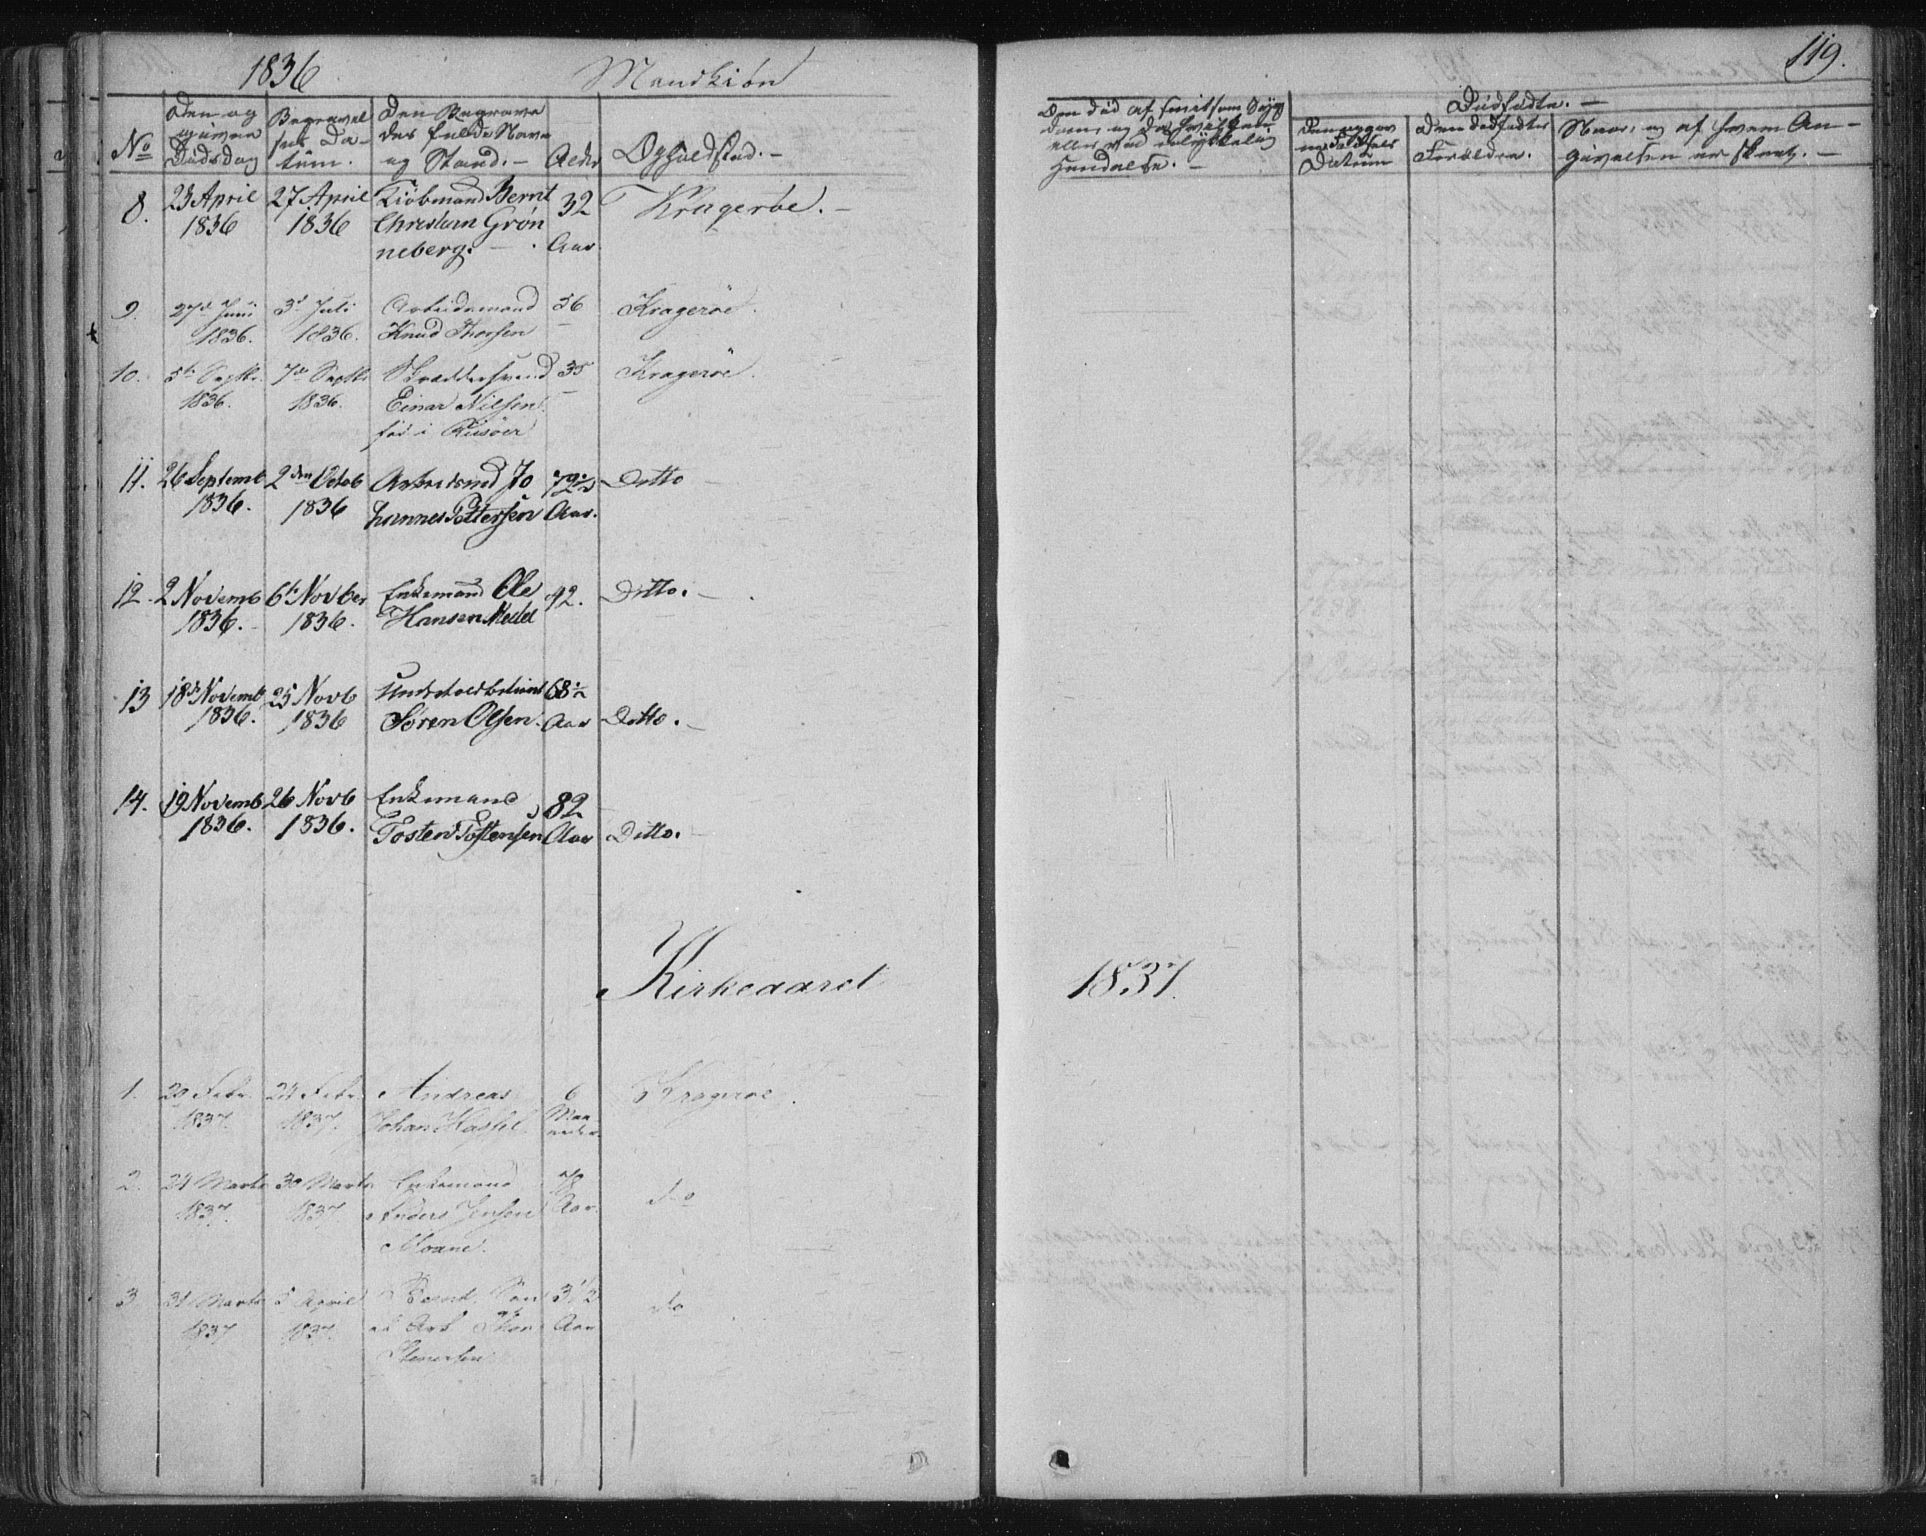 SAKO, Kragerø kirkebøker, F/Fa/L0005: Ministerialbok nr. 5, 1832-1847, s. 119